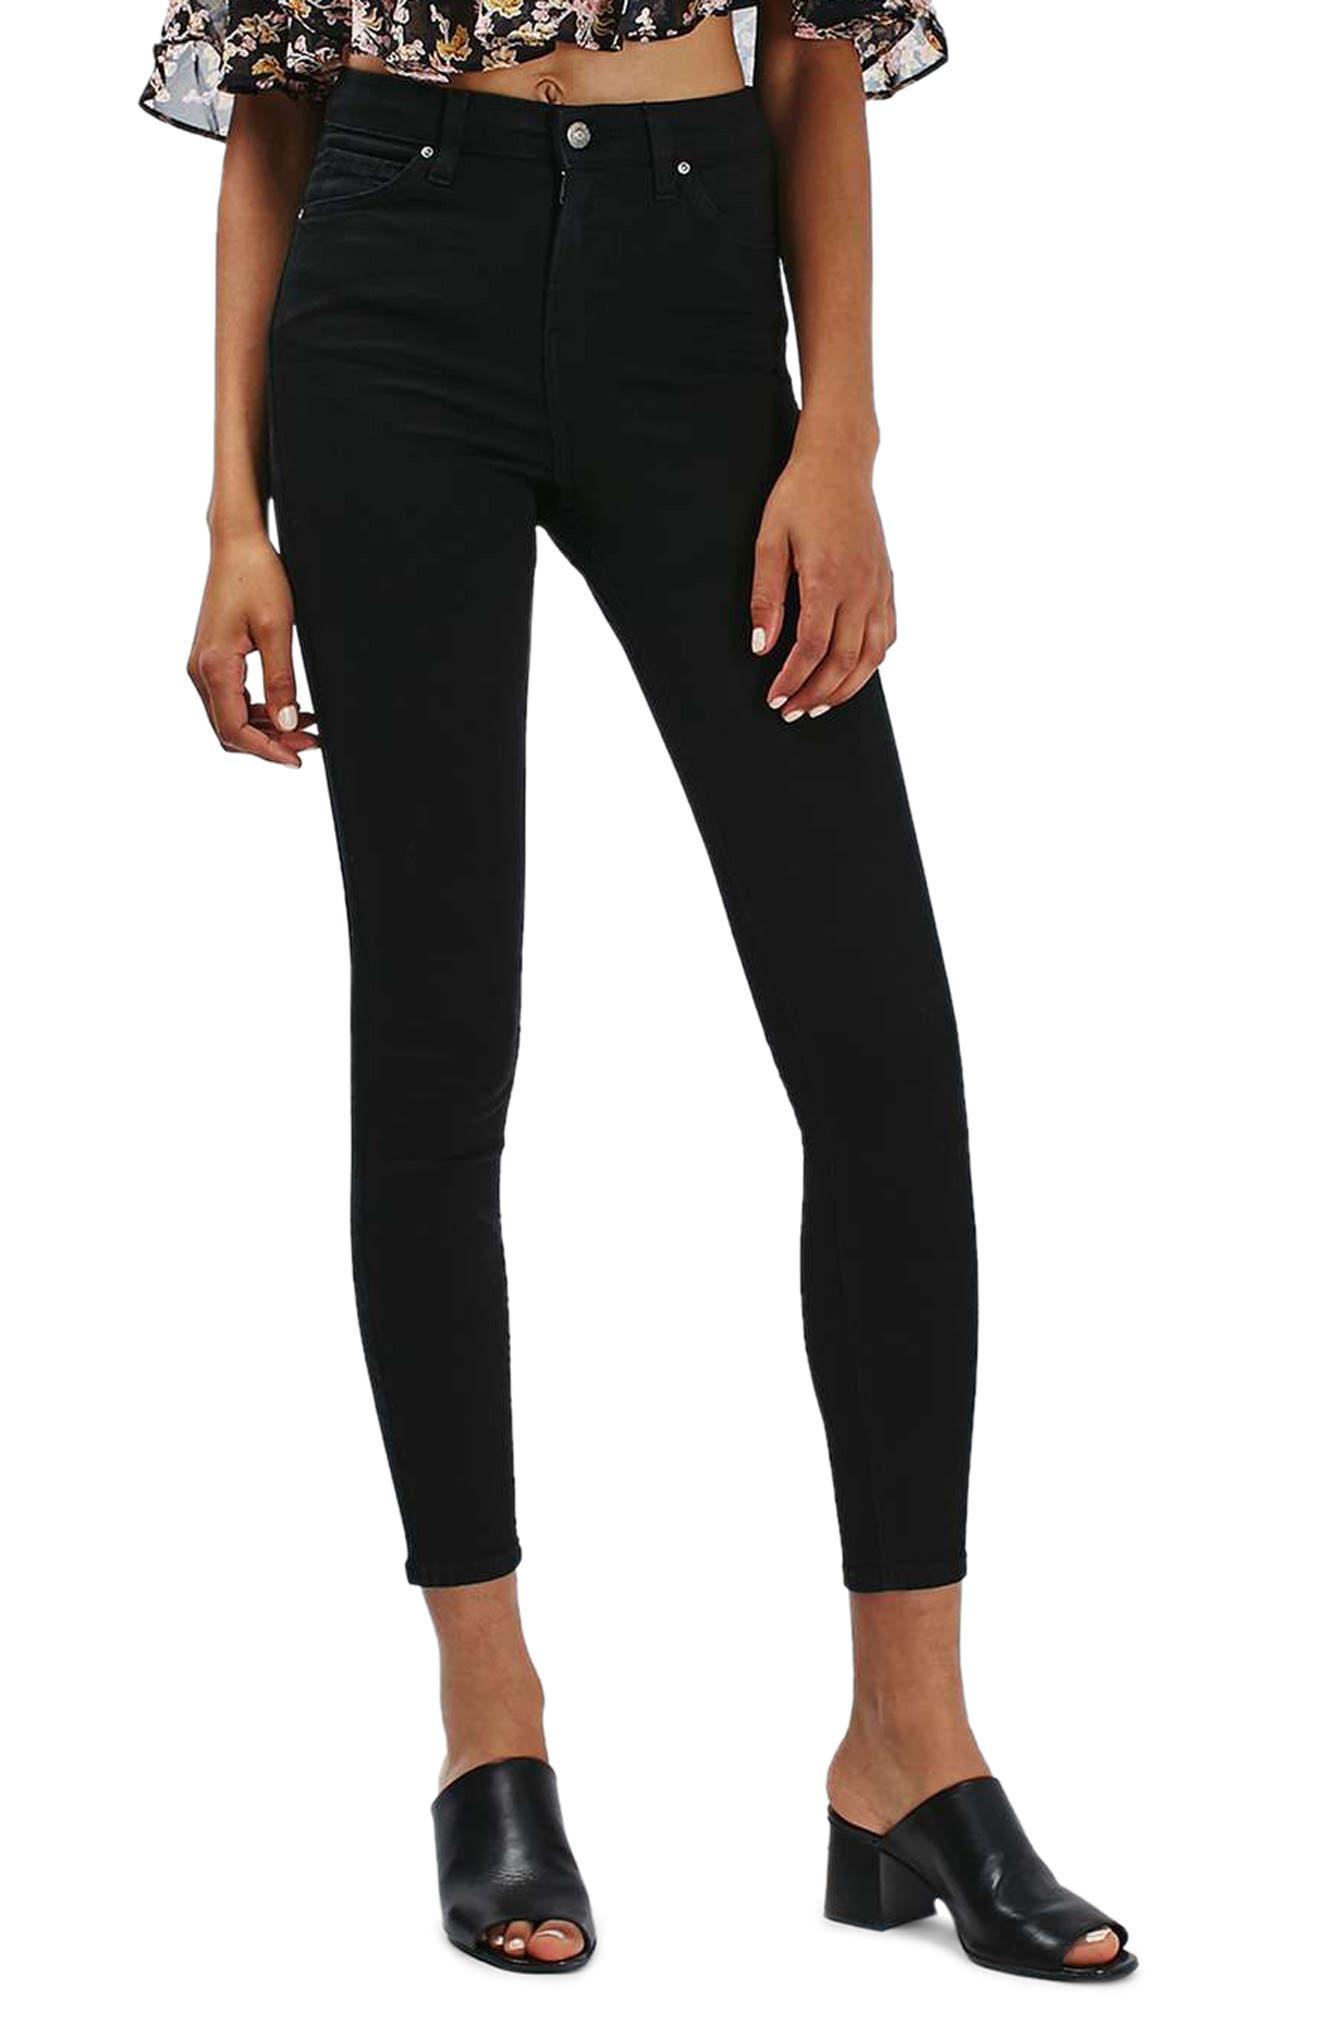 Alternate Image 1 Selected - Topshop Jamie High Waist Ankle Grazer Skinny Jeans